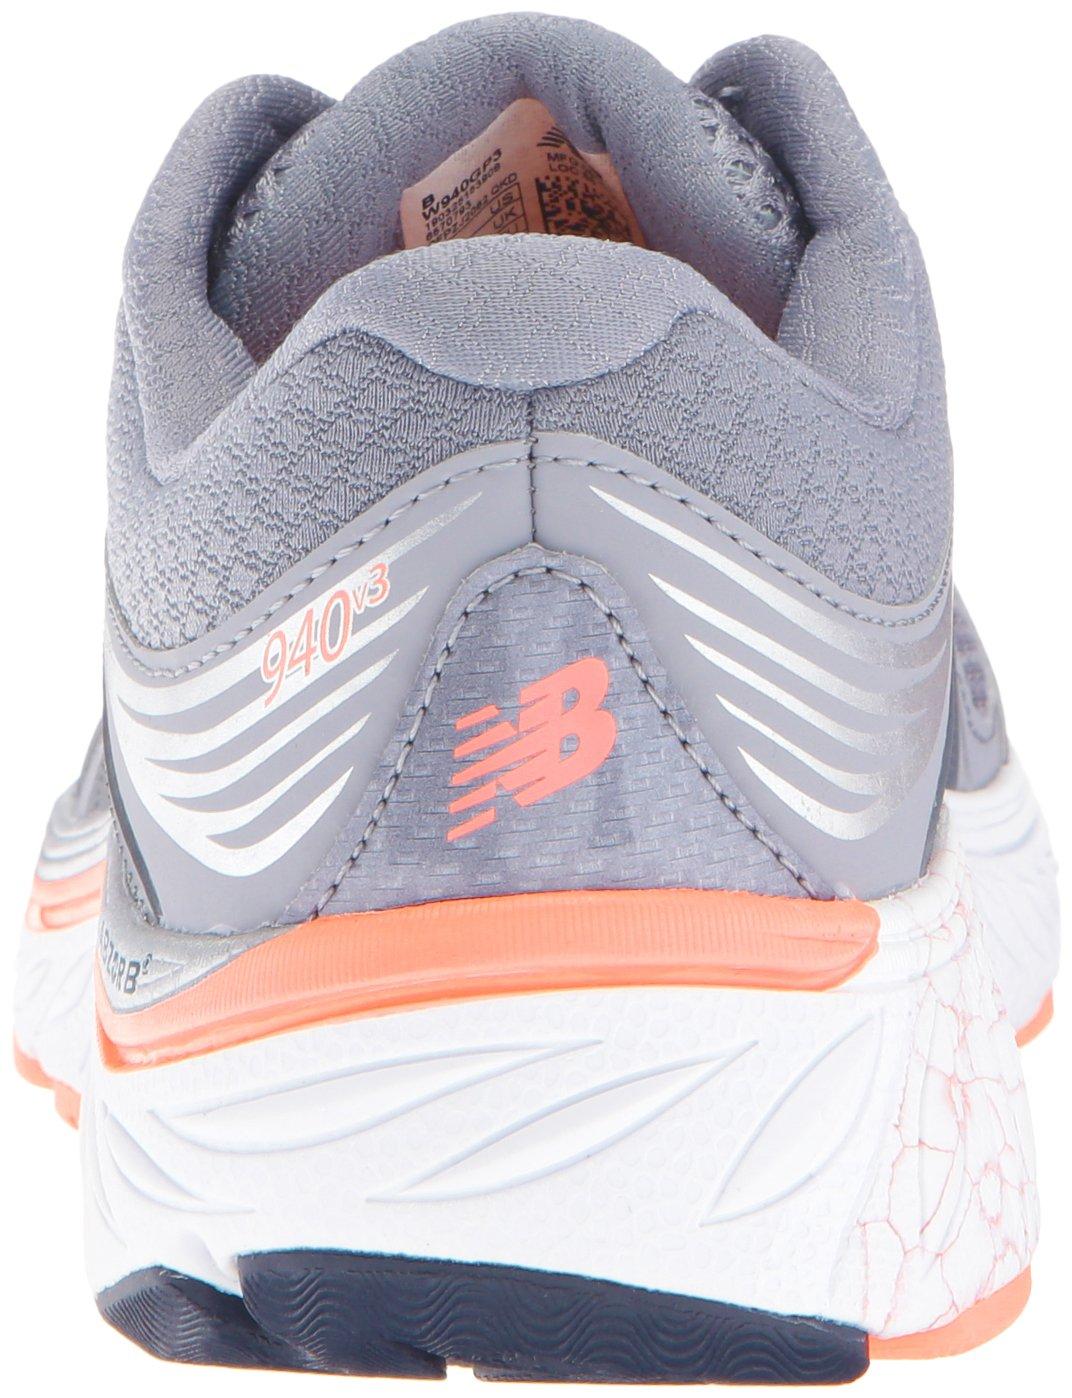 New Balance Women's w940v3 Running Shoe B01CQVF4IS 11 B(M) US|Silver